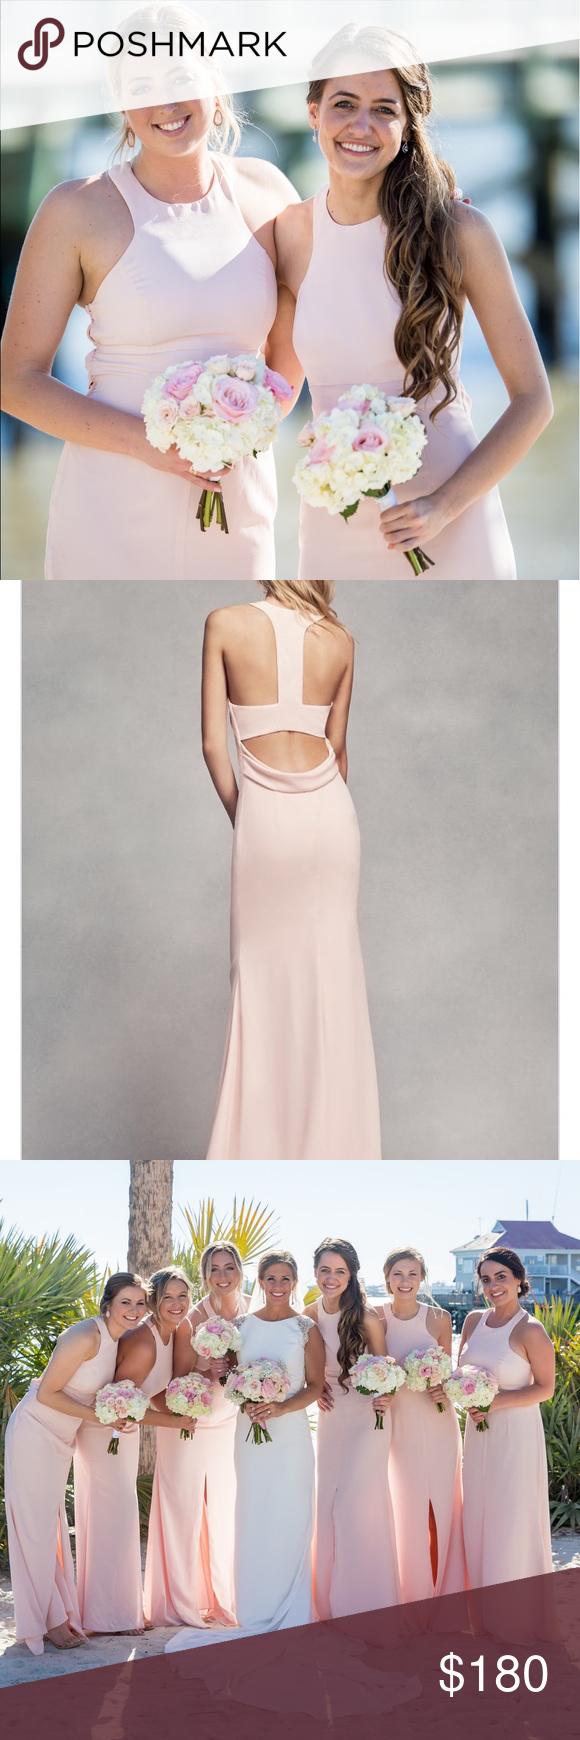 Long halter bridesmaid dress with skirt slit blush vera wang long halter bridesmaid dress with skirt slit blush ombrellifo Image collections